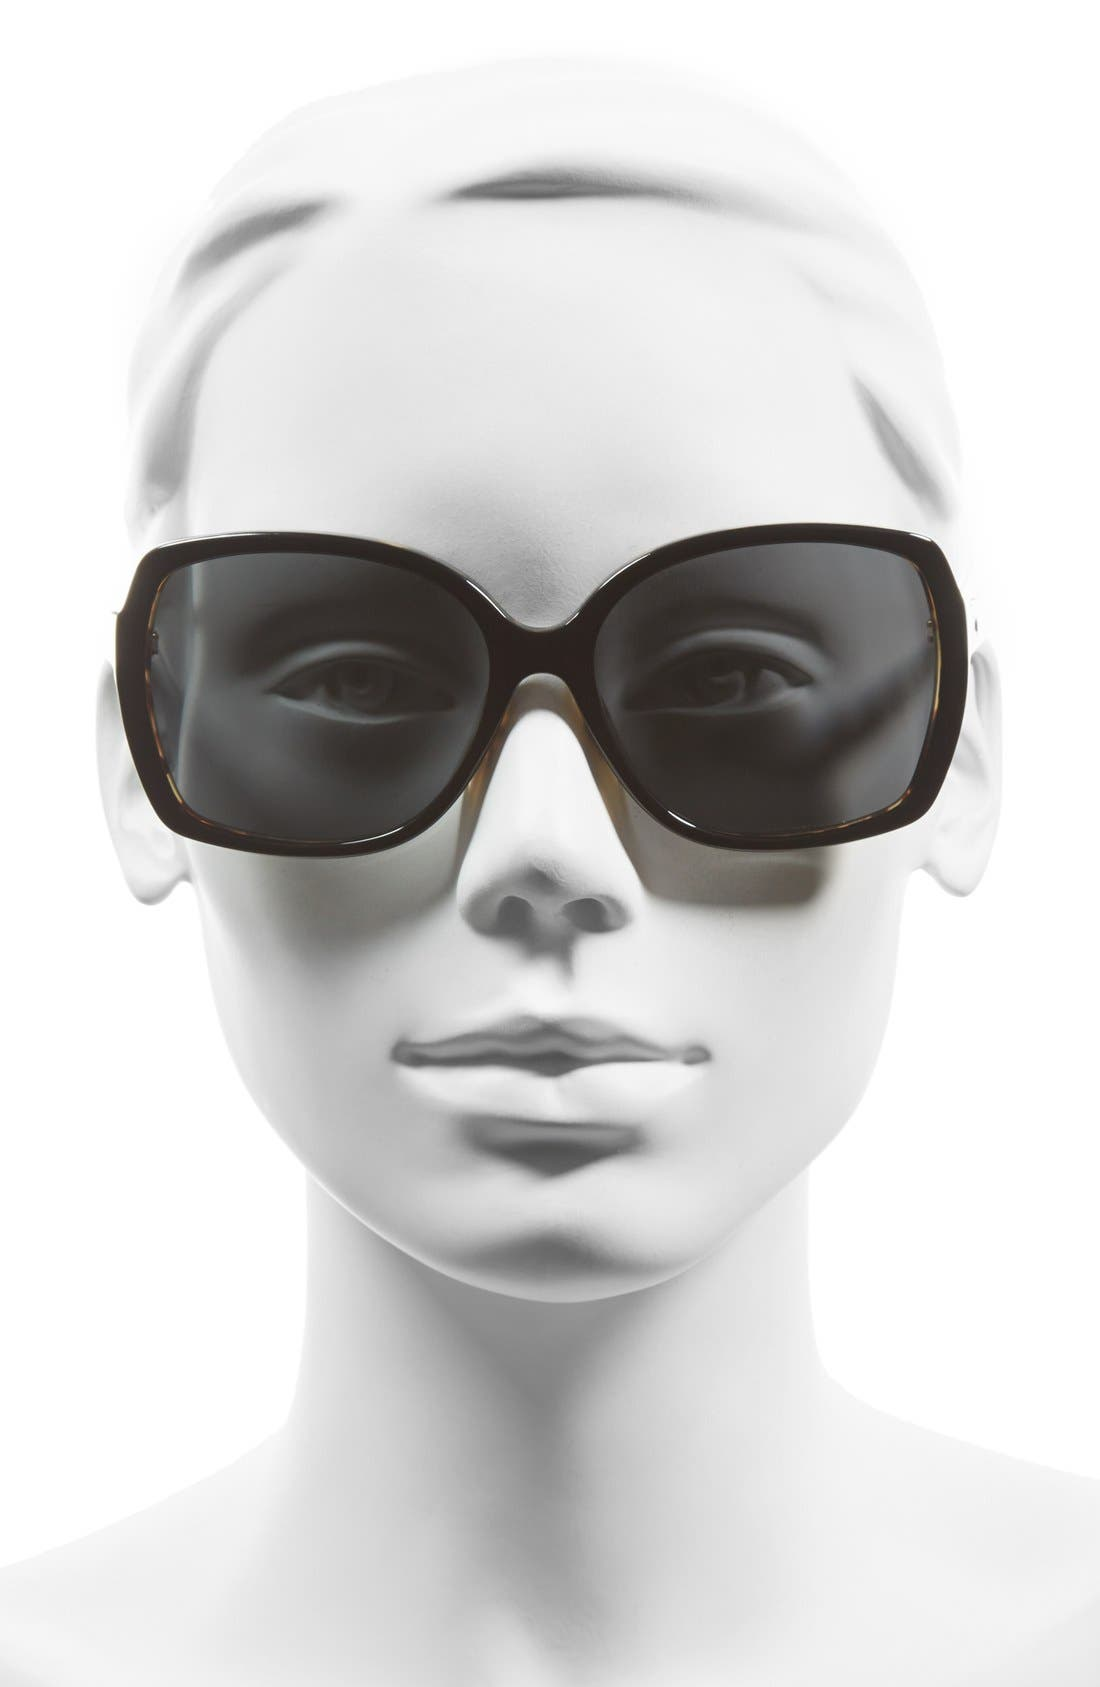 KATE SPADE NEW YORK,                             'darilynn' 58mm polarized sunglasses,                             Alternate thumbnail 2, color,                             001